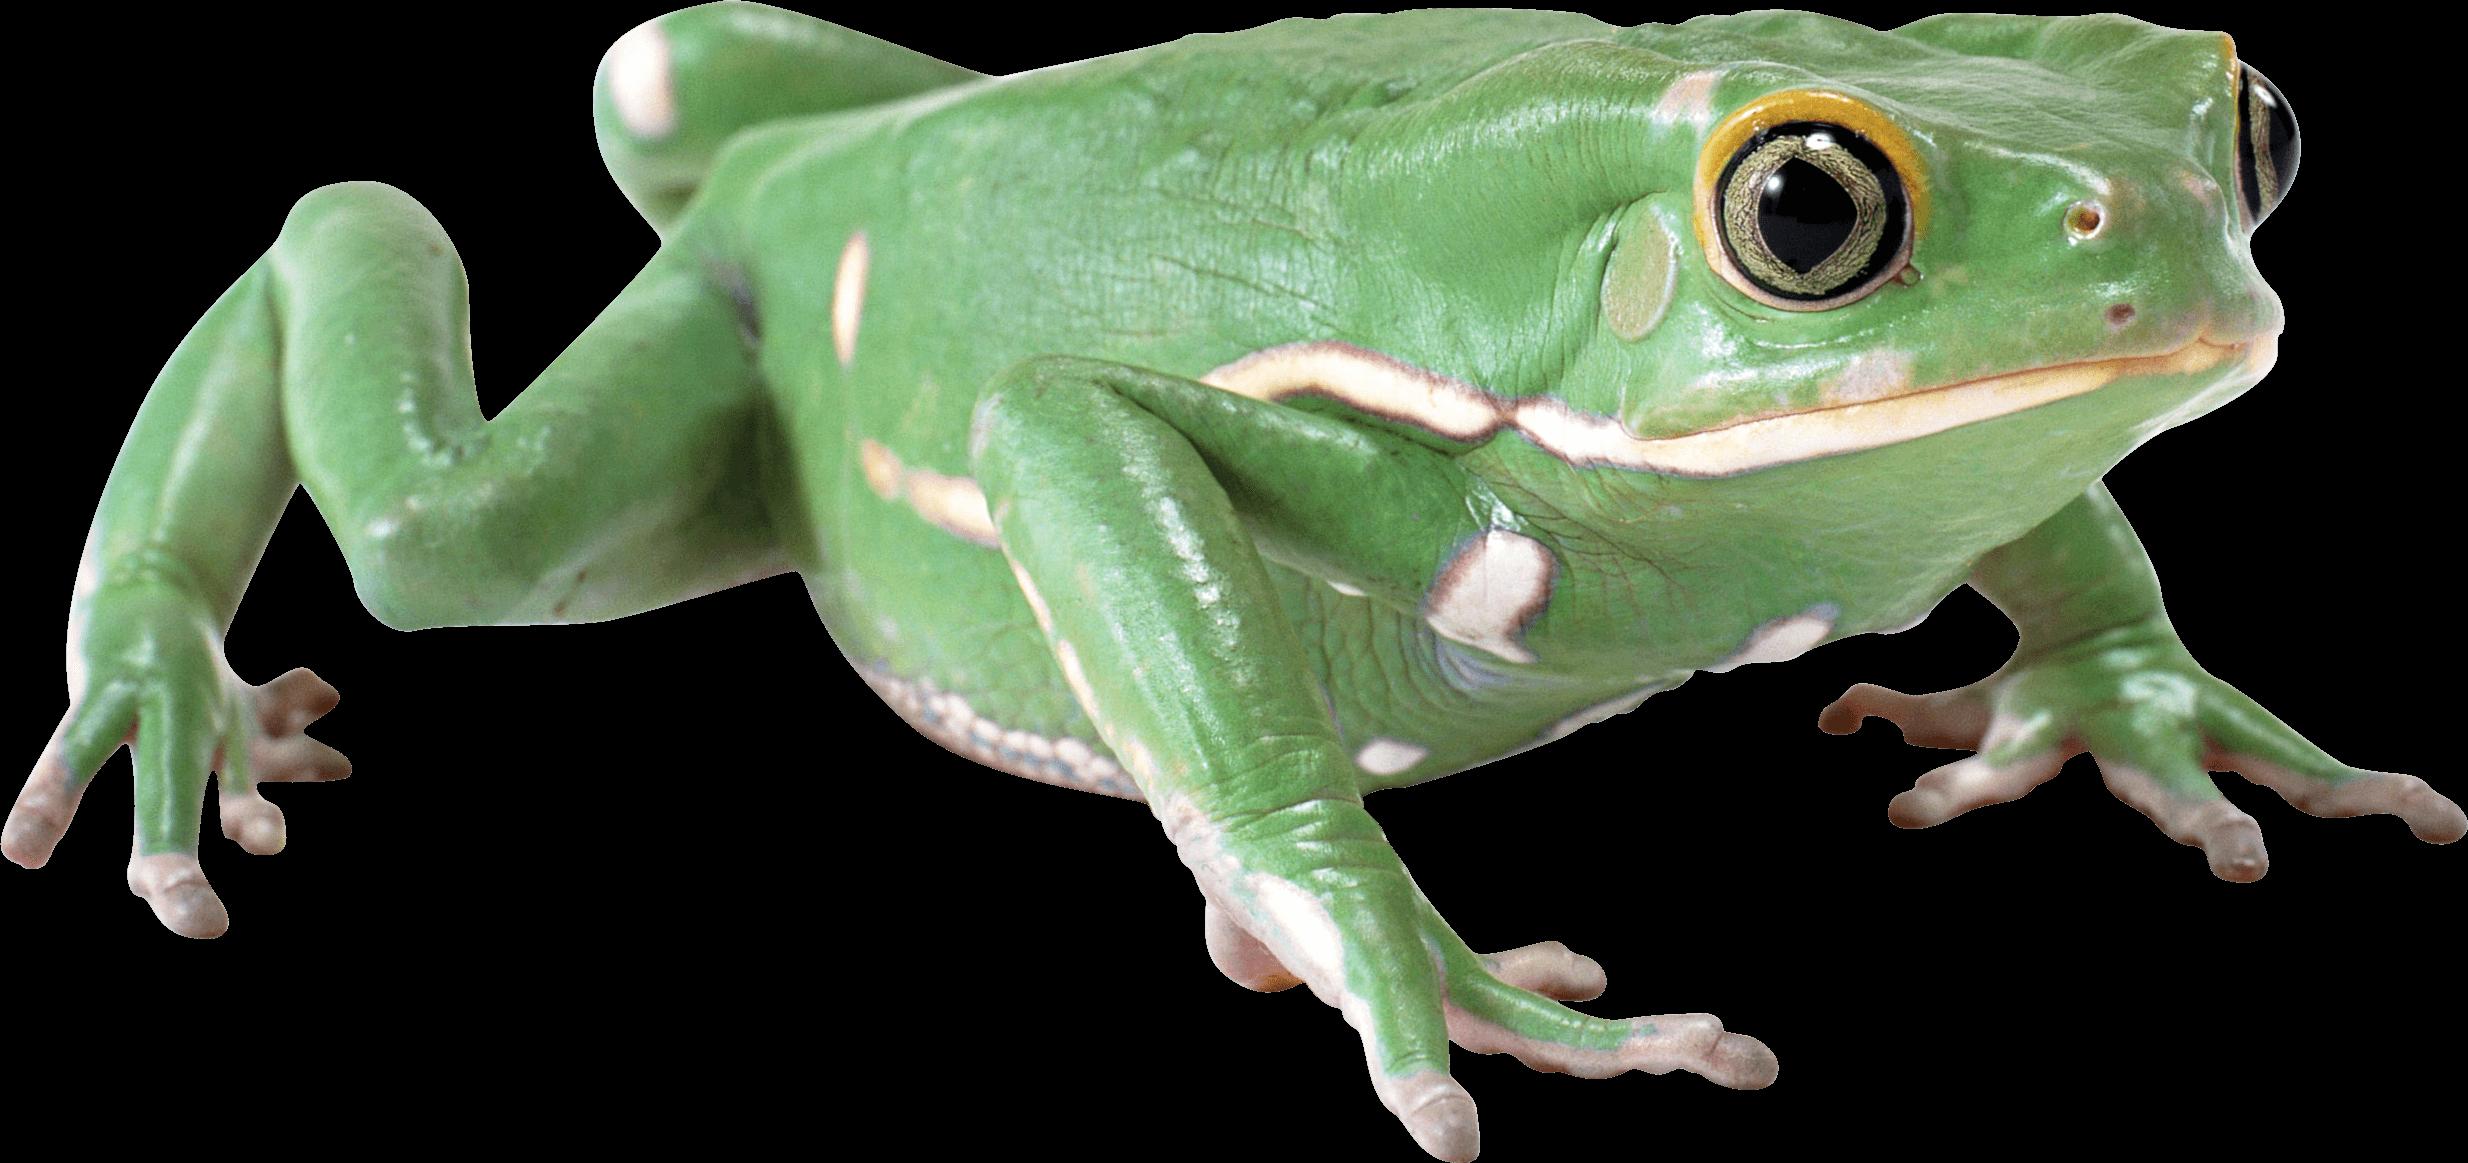 Almost Flat Frog transparent PNG.